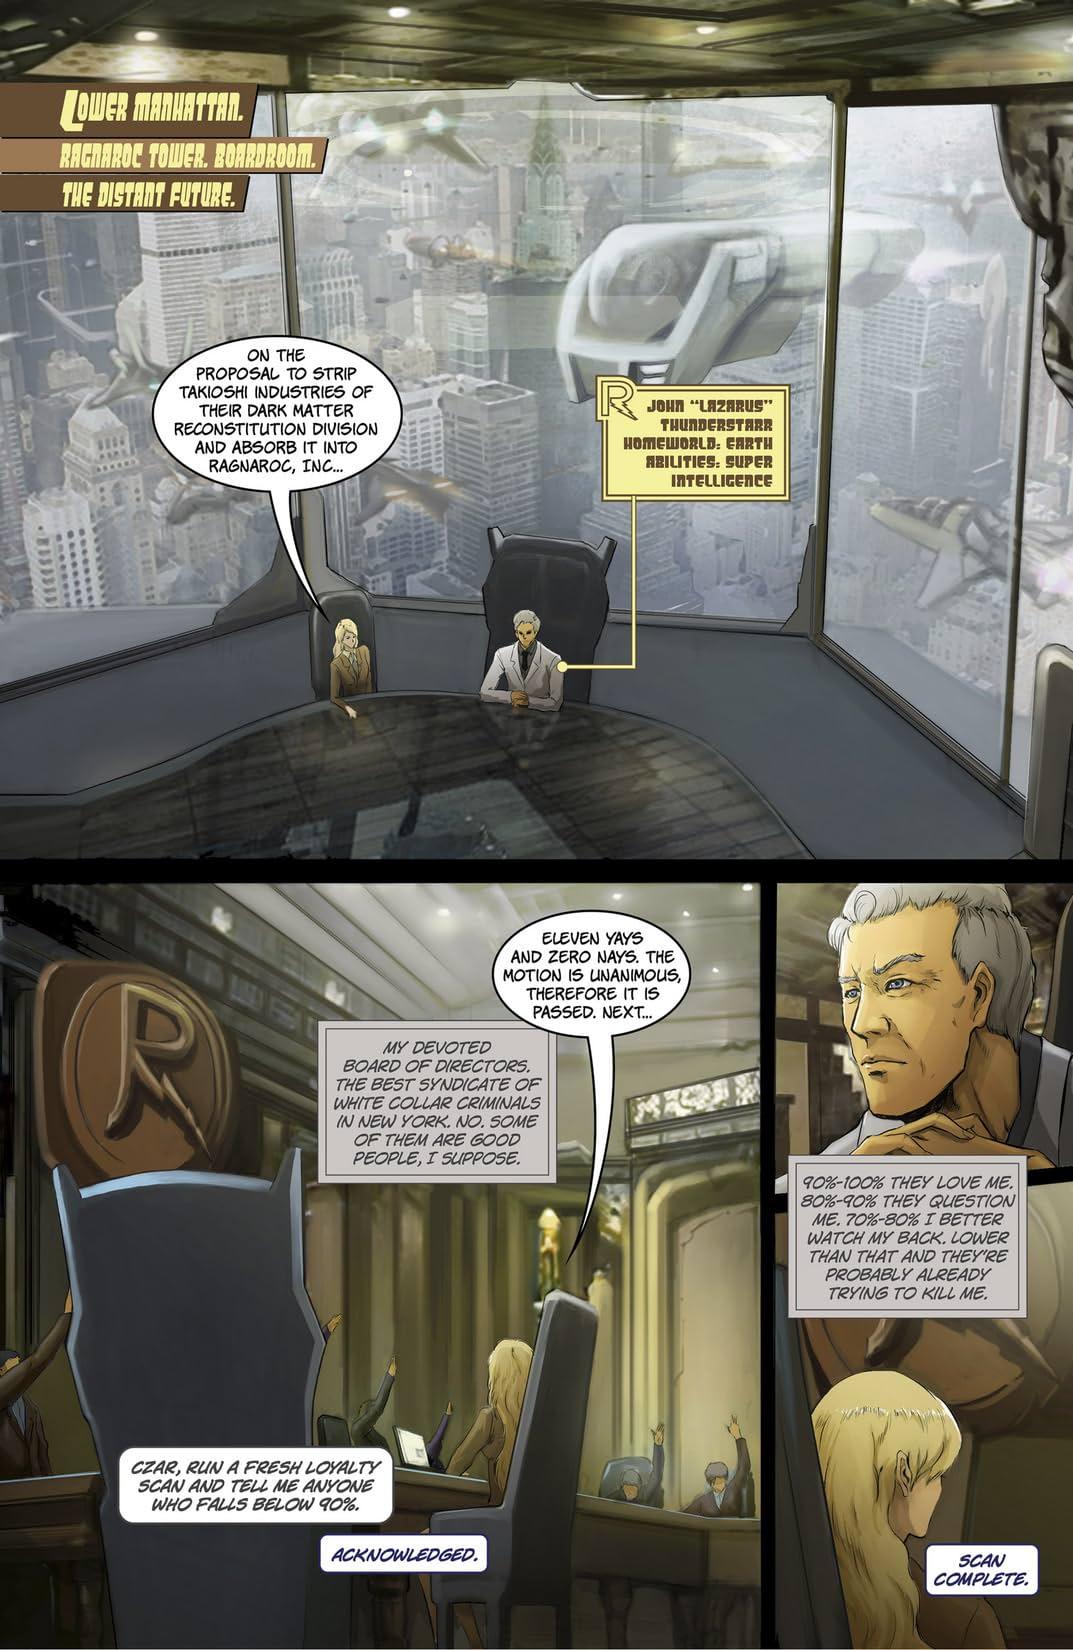 Ragnaroc Inc: Embrace Oblivion #1